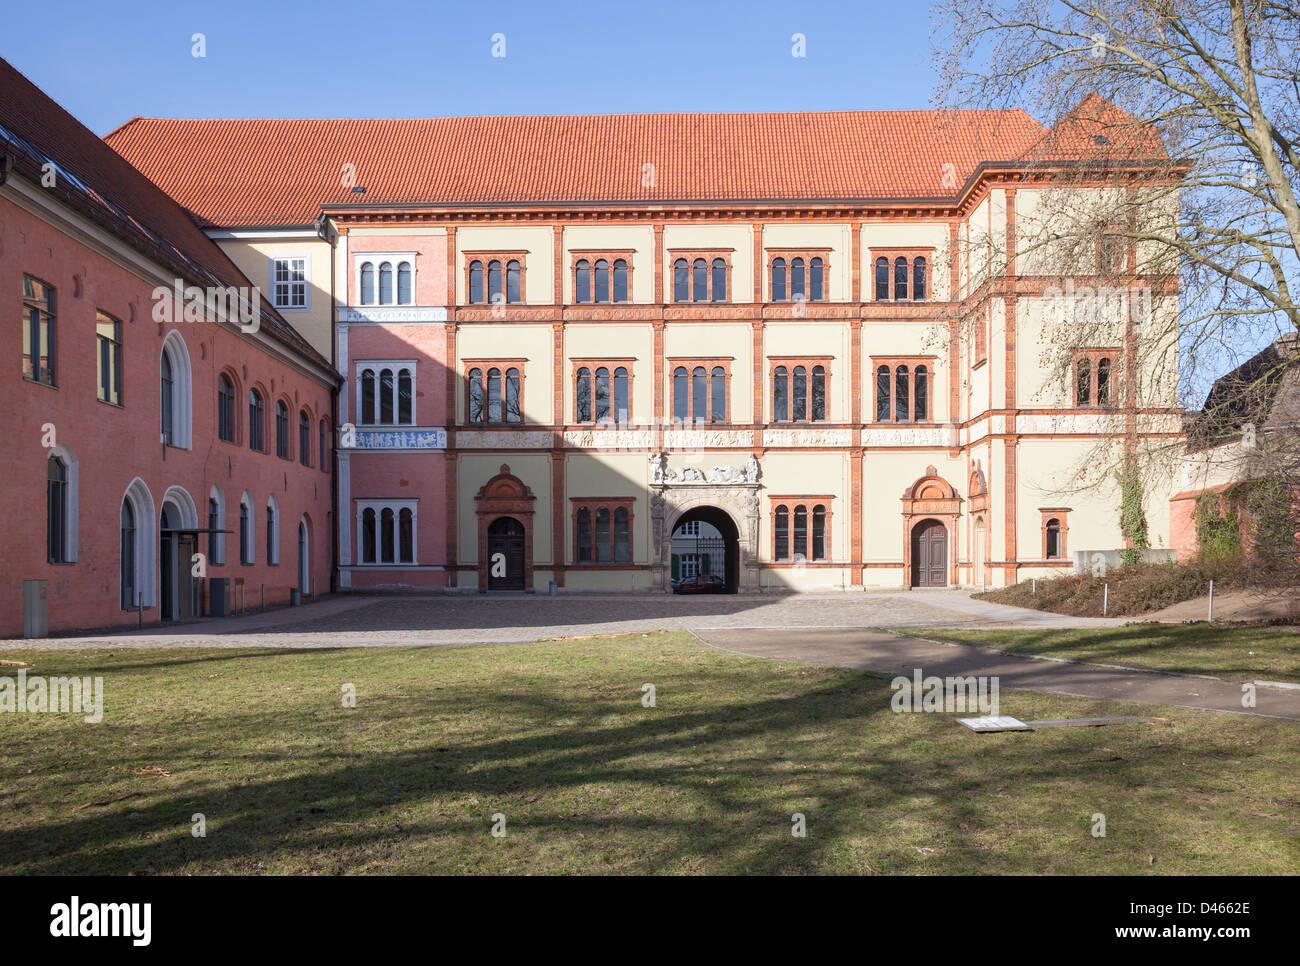 Fürstenhof, Wismar, Mecklenburg Vorpommern, Germany Stock Photo